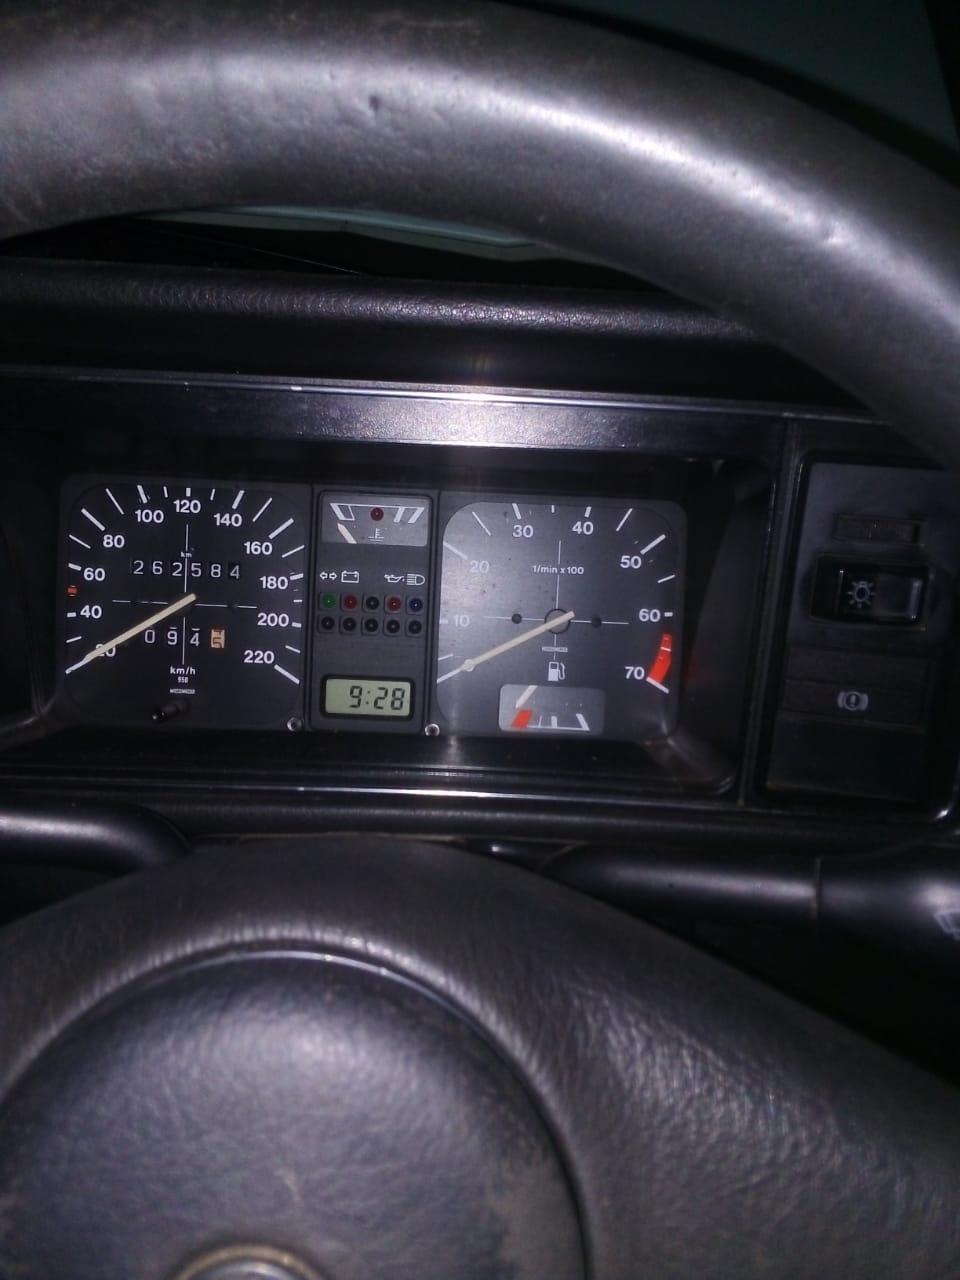 2001 VW Citi CITI 1.4i